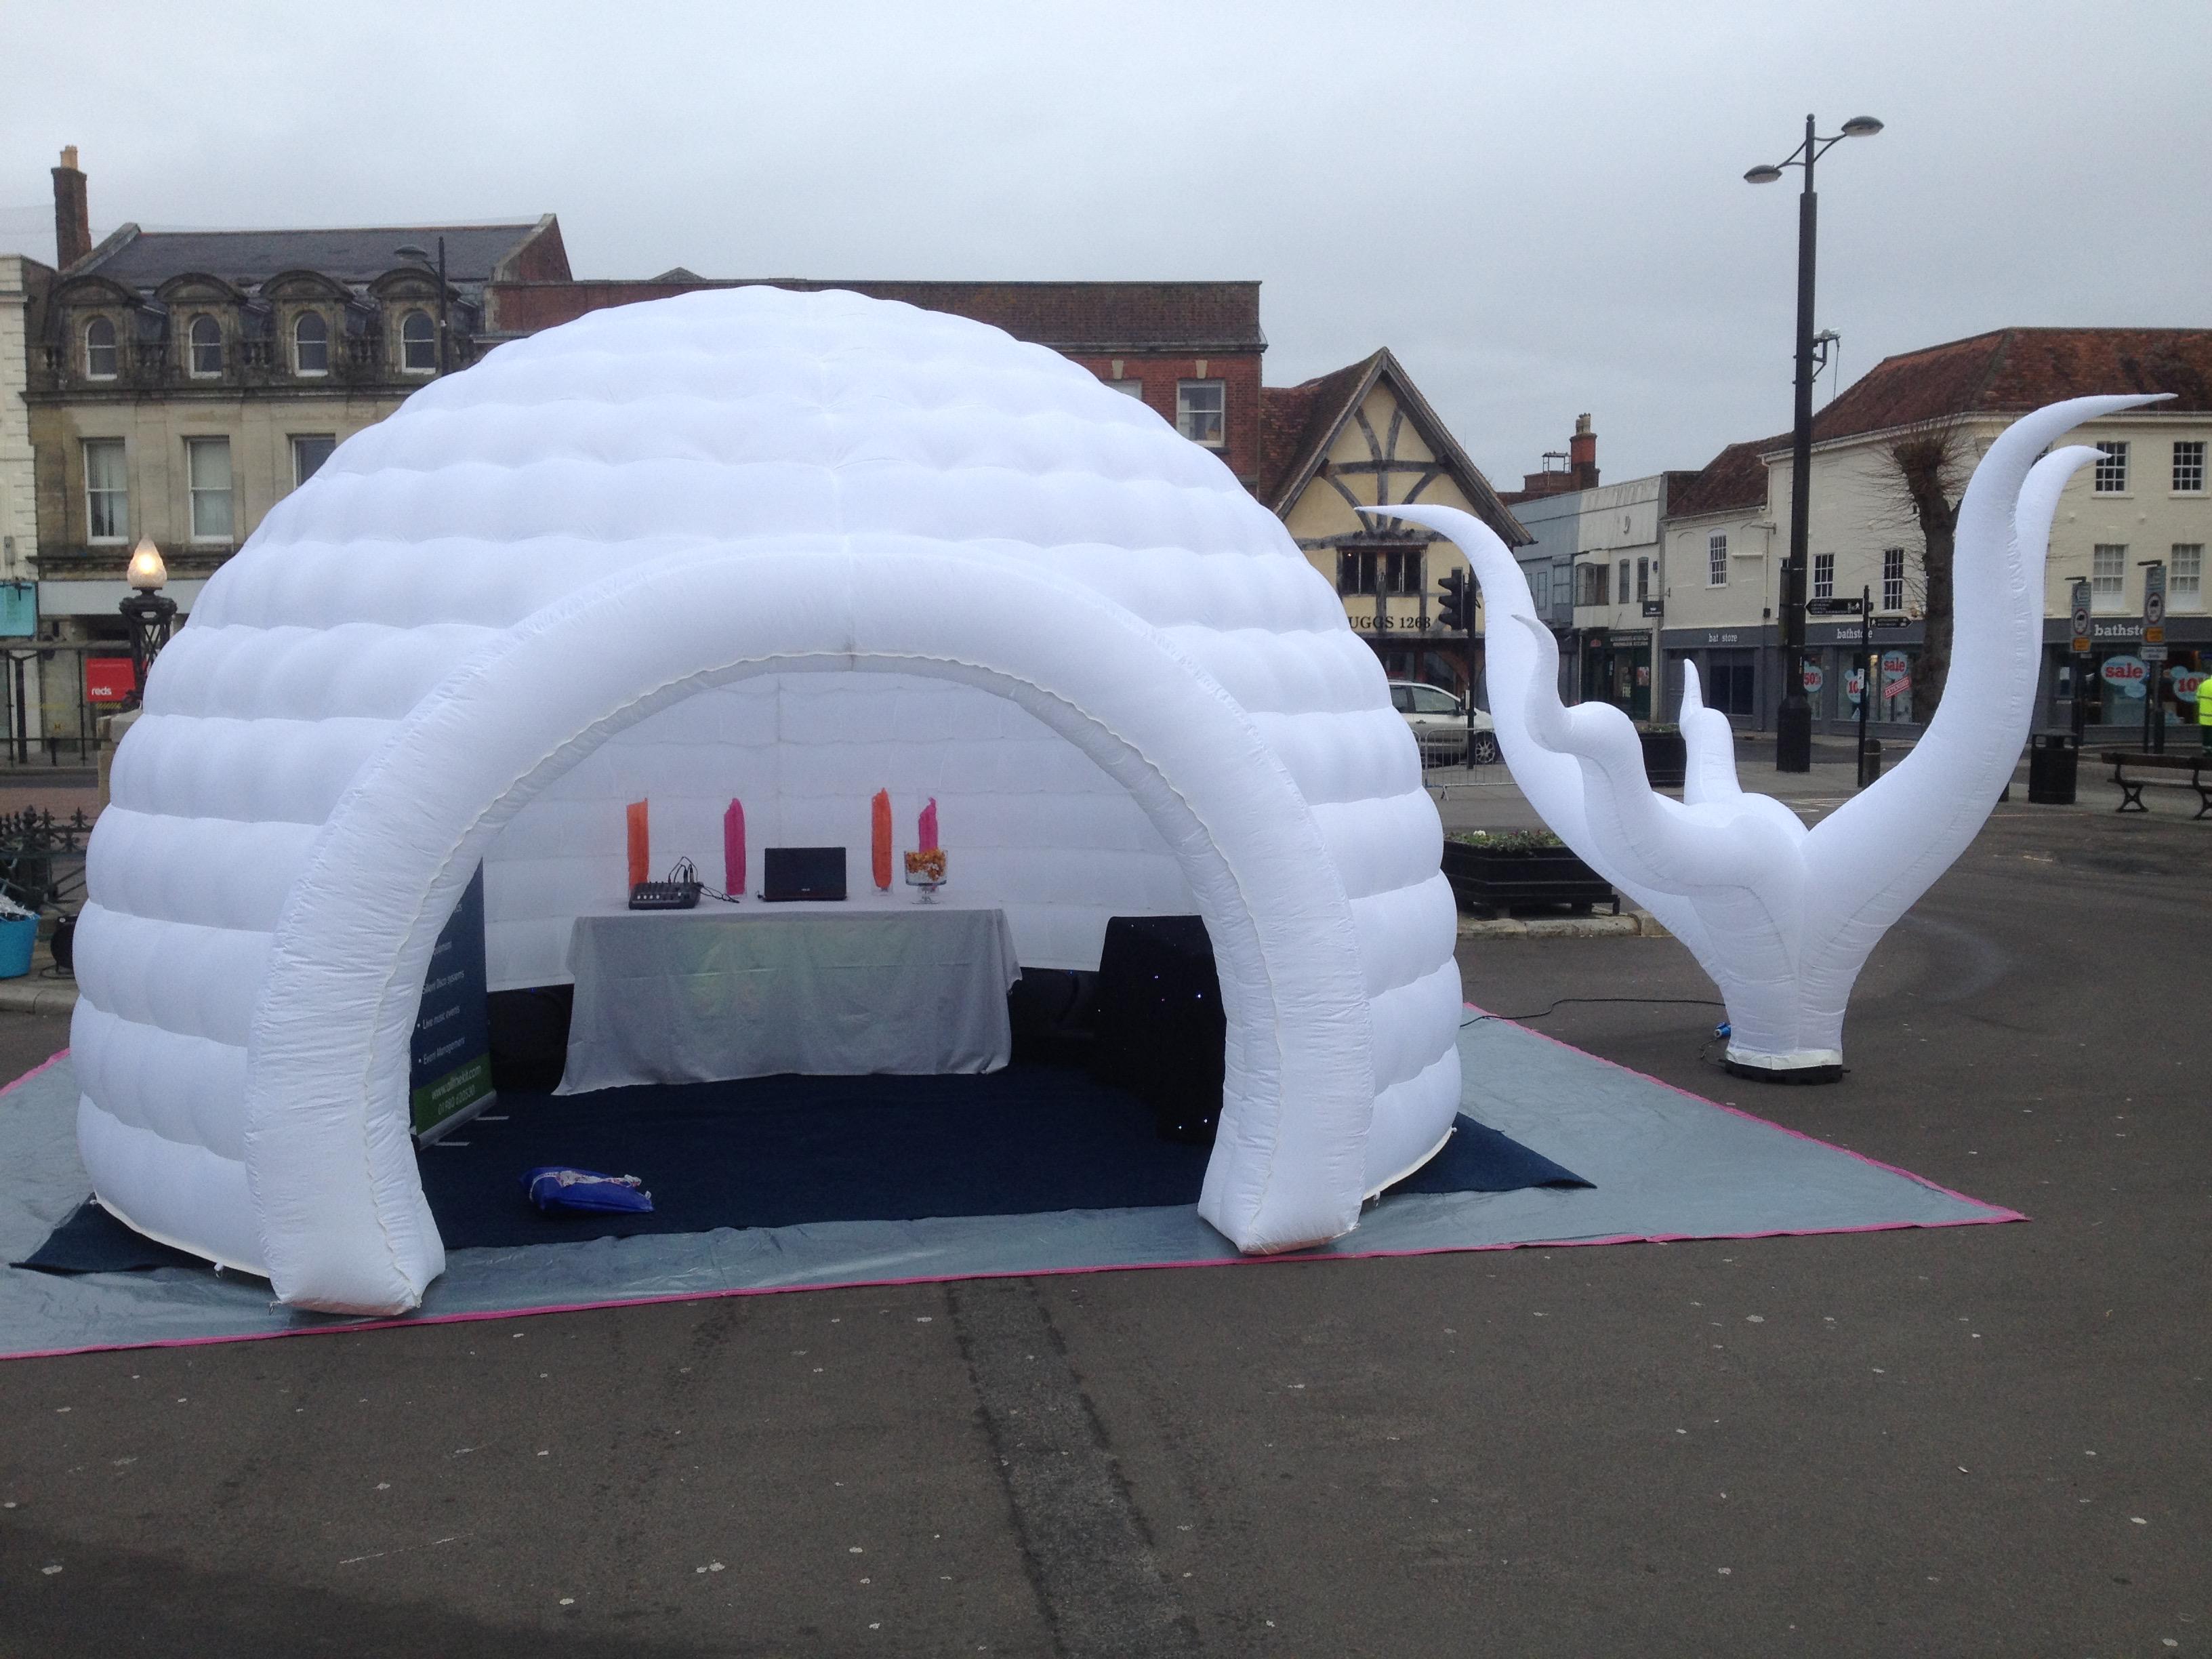 5m Igloo in Salisbury Market place